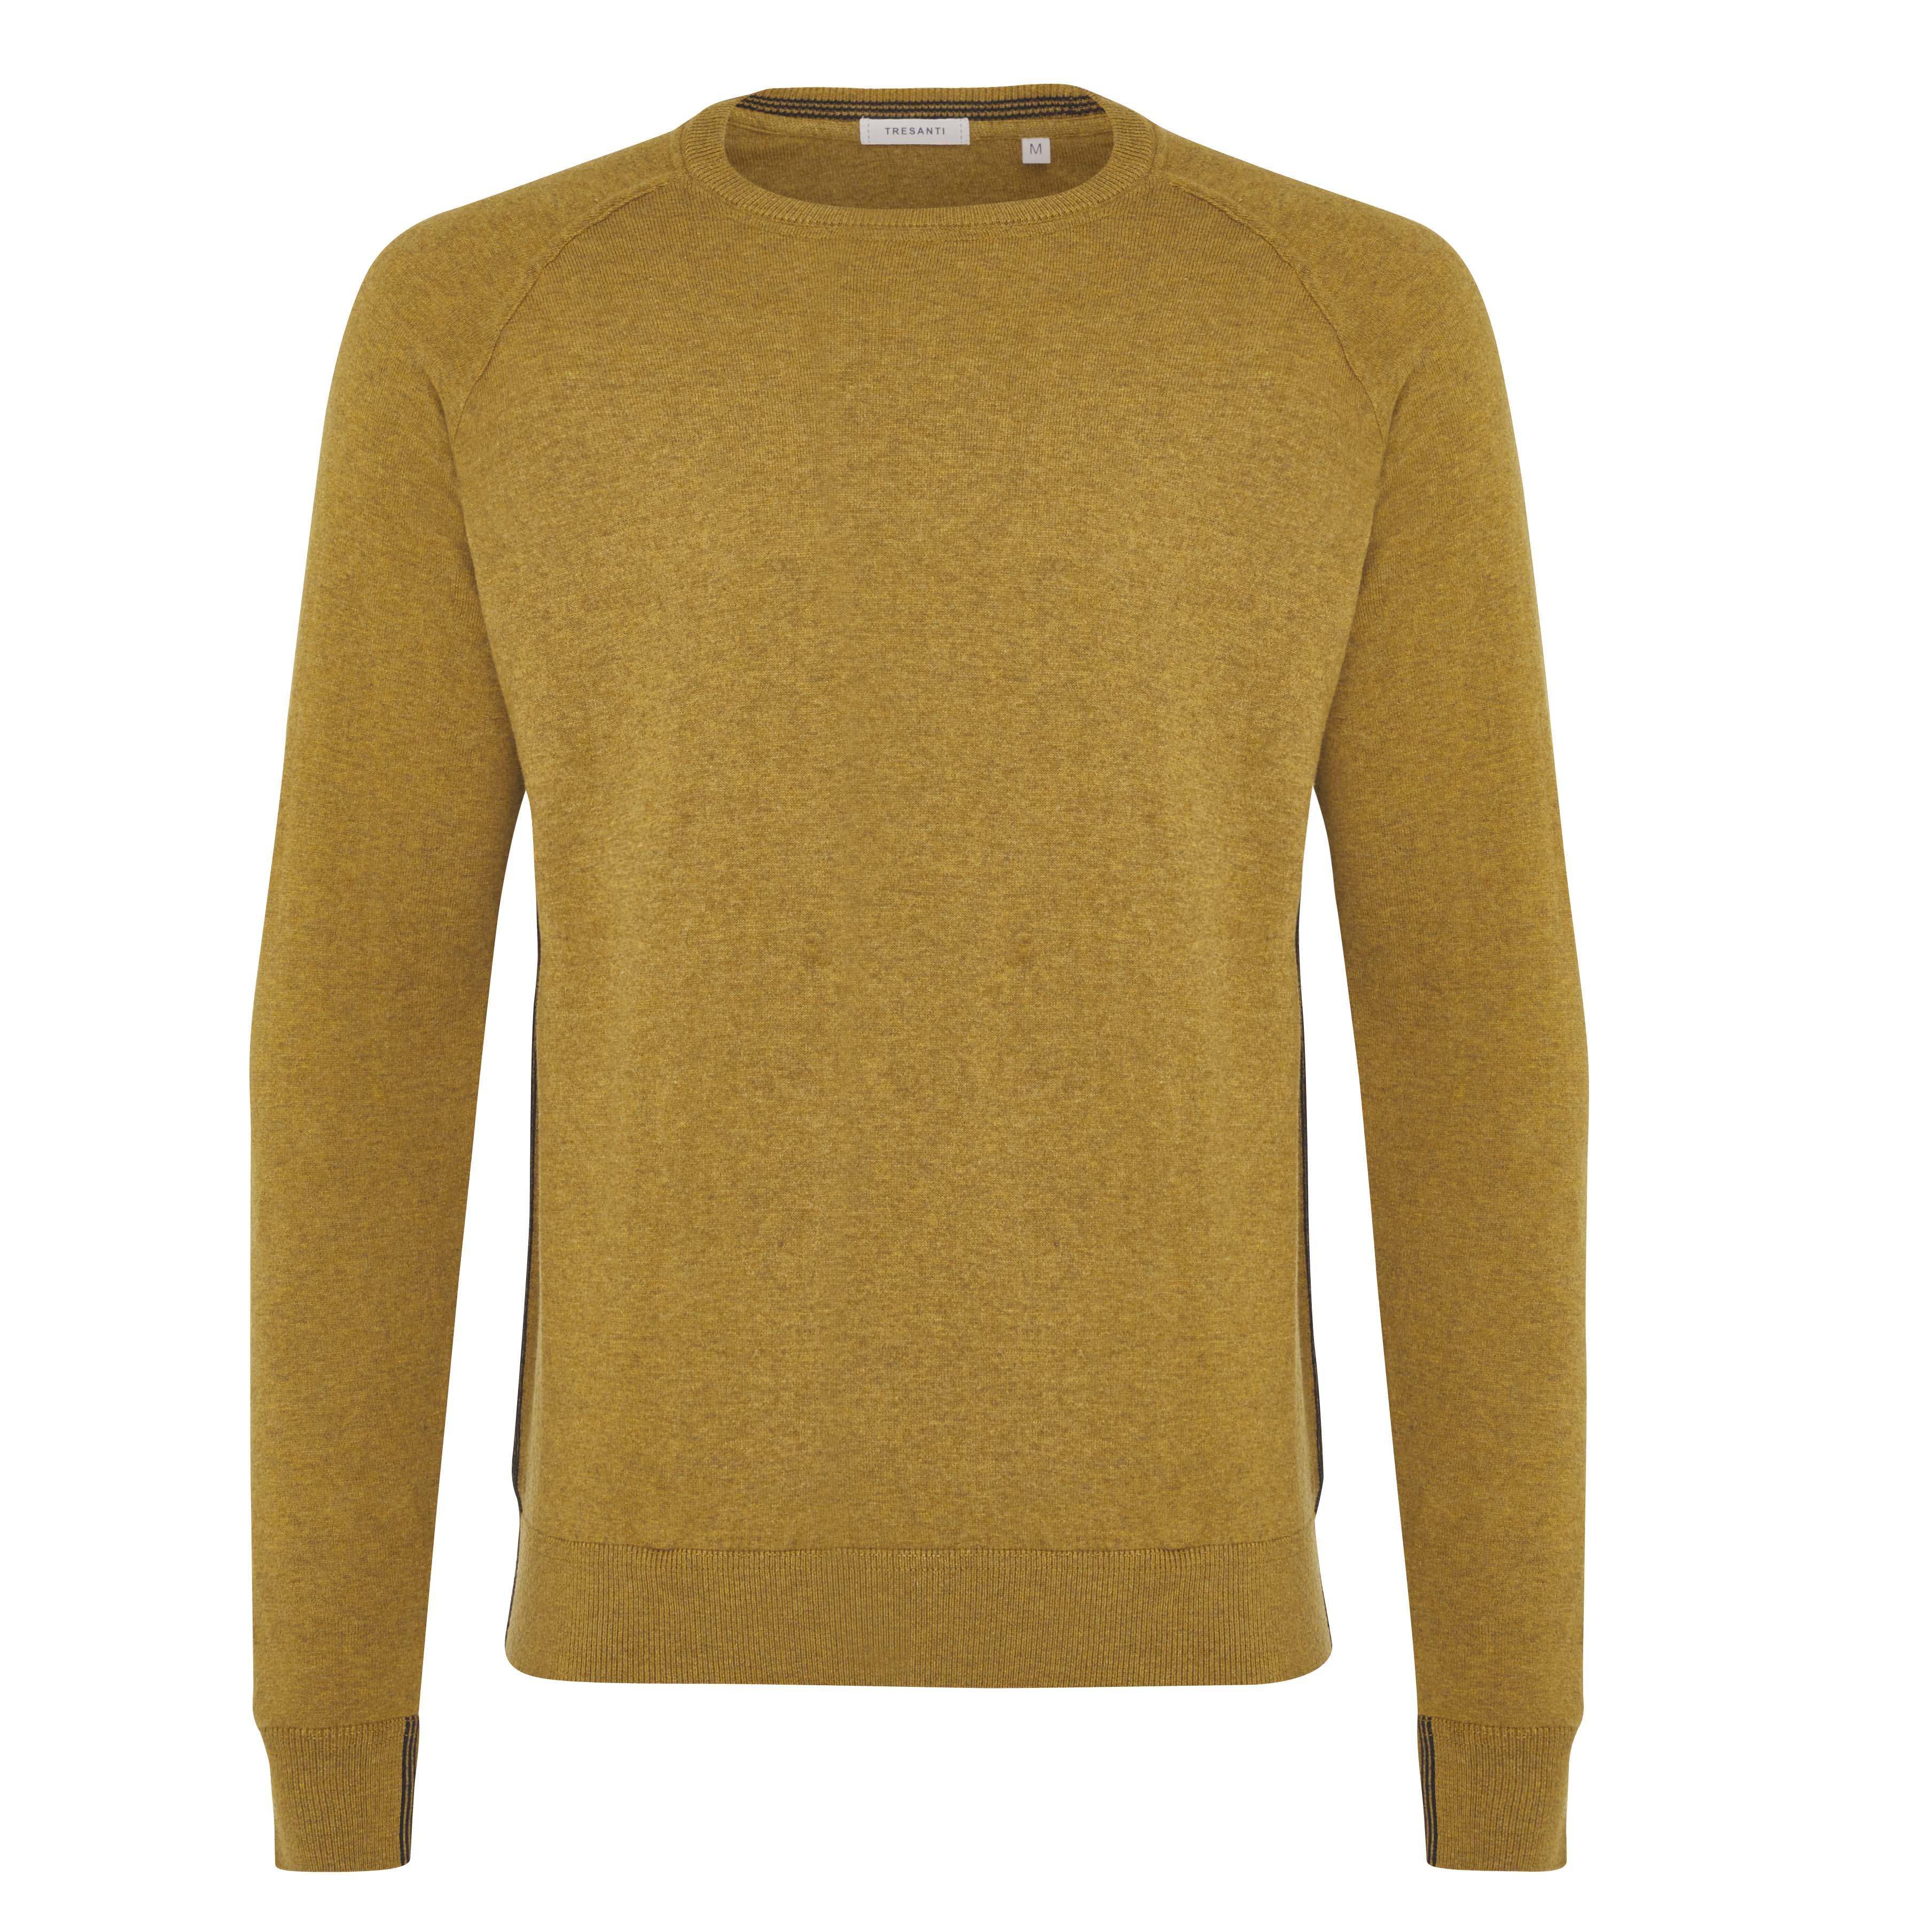 James | Pullover raglan ocher yellow